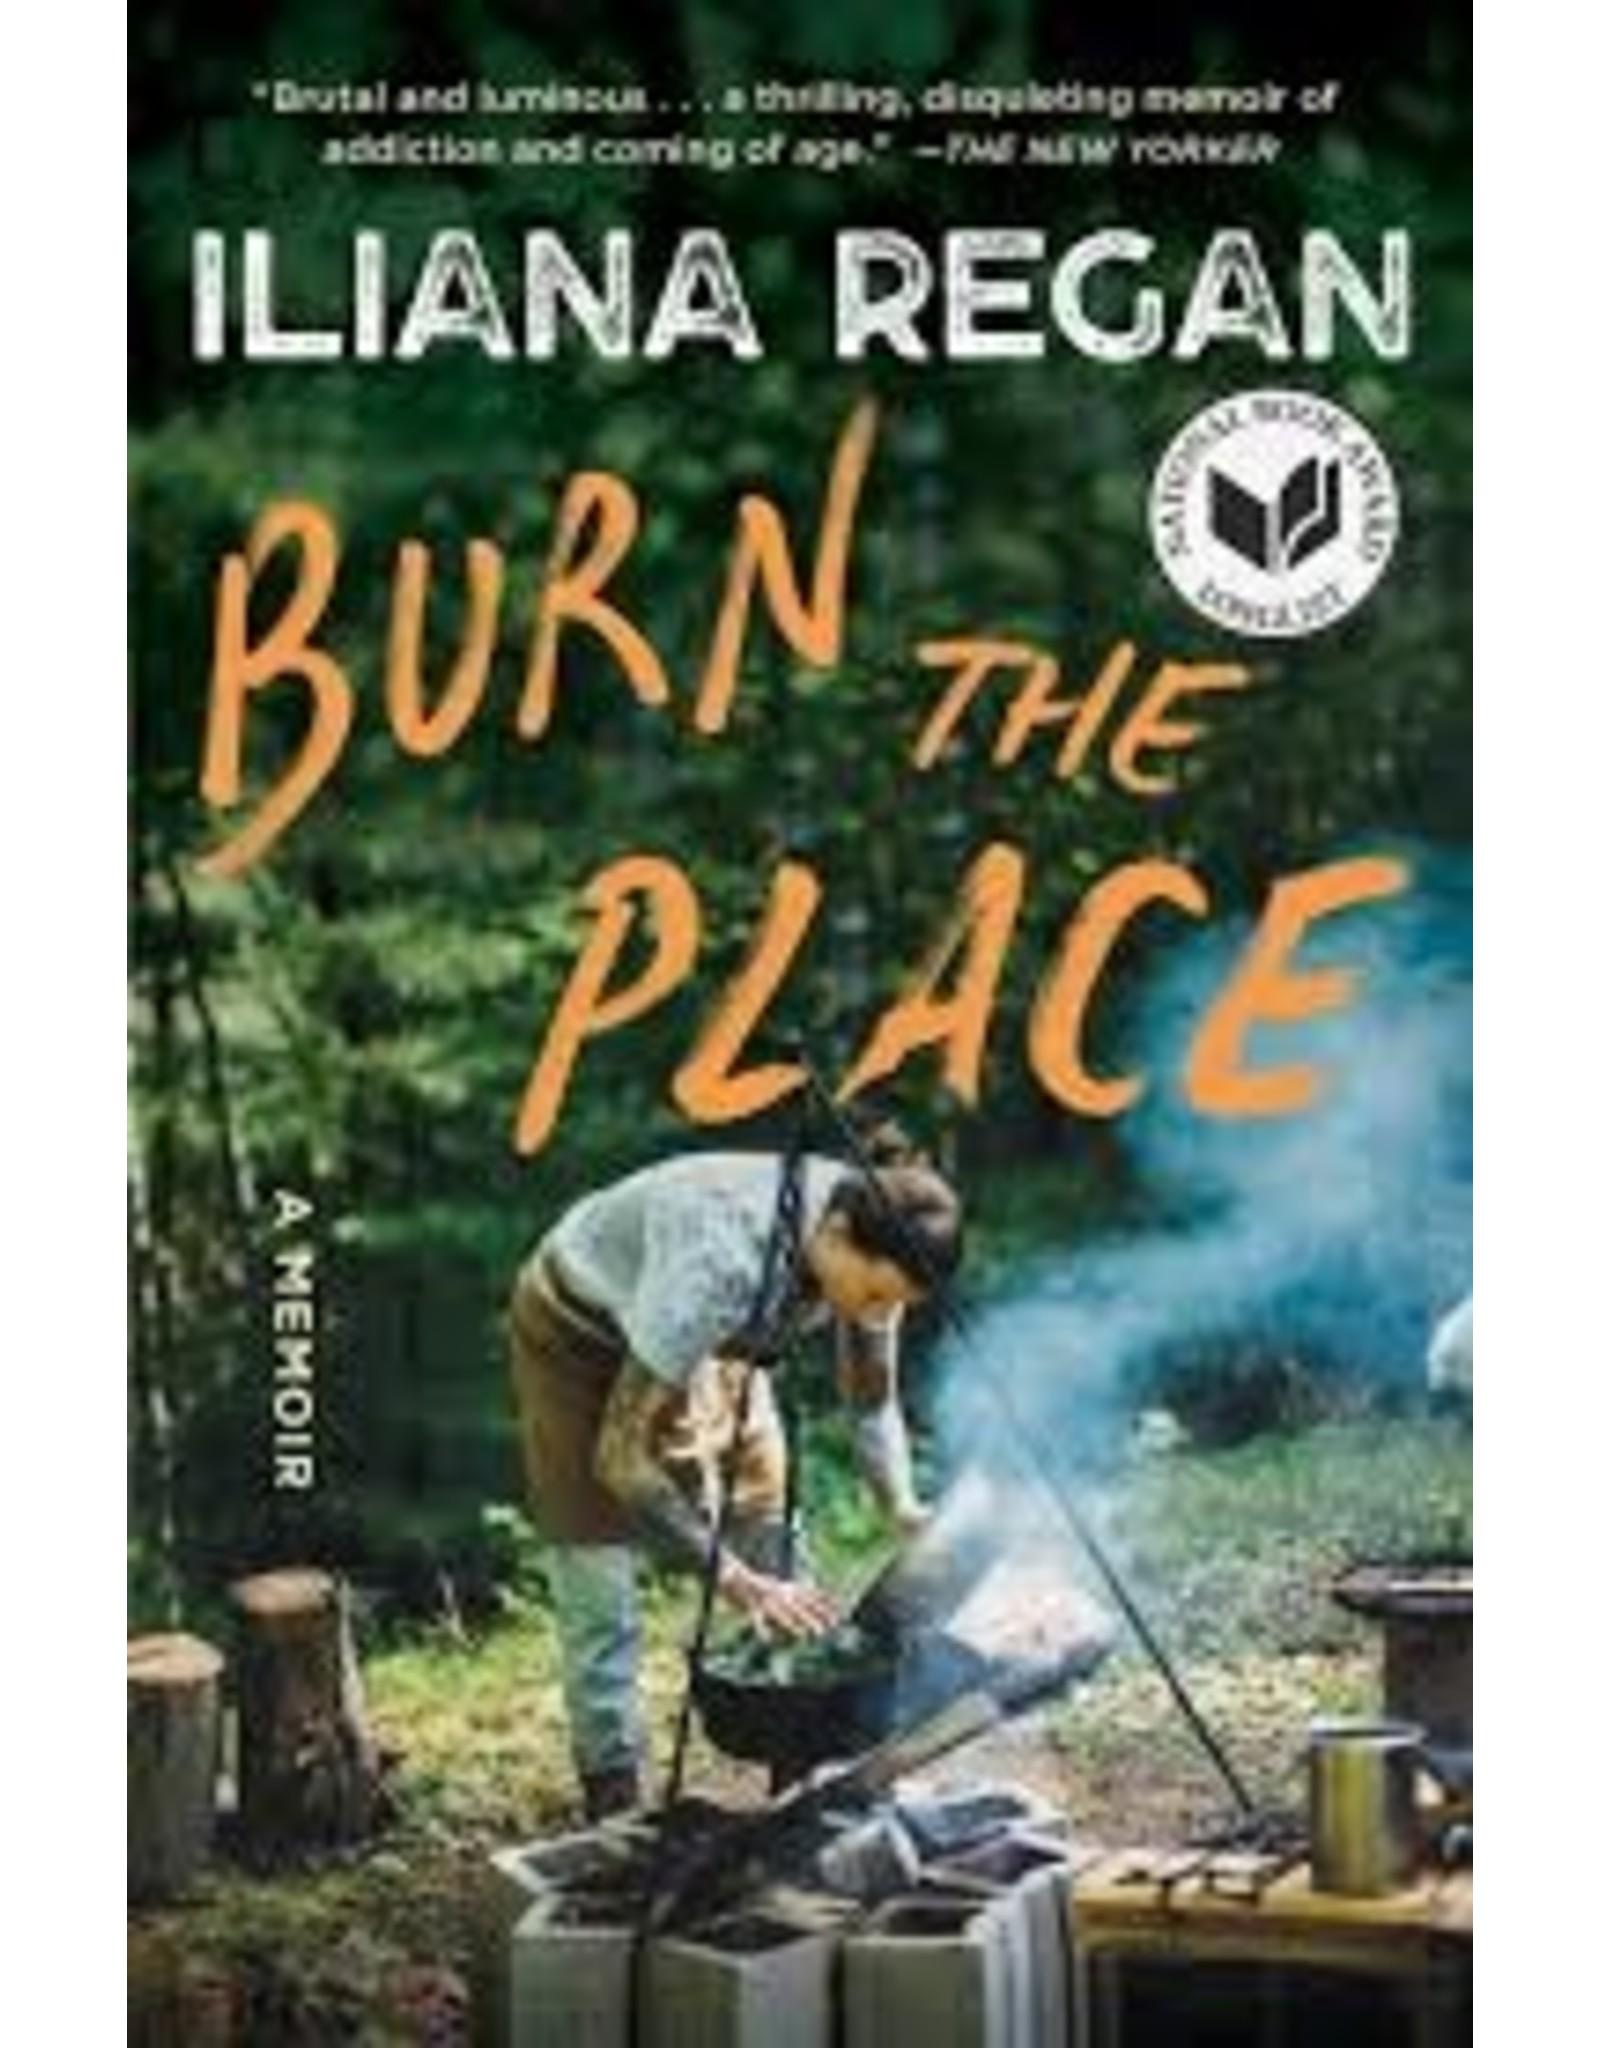 Books Burn the Place by ILiana Regan ( Holiday Catalog)